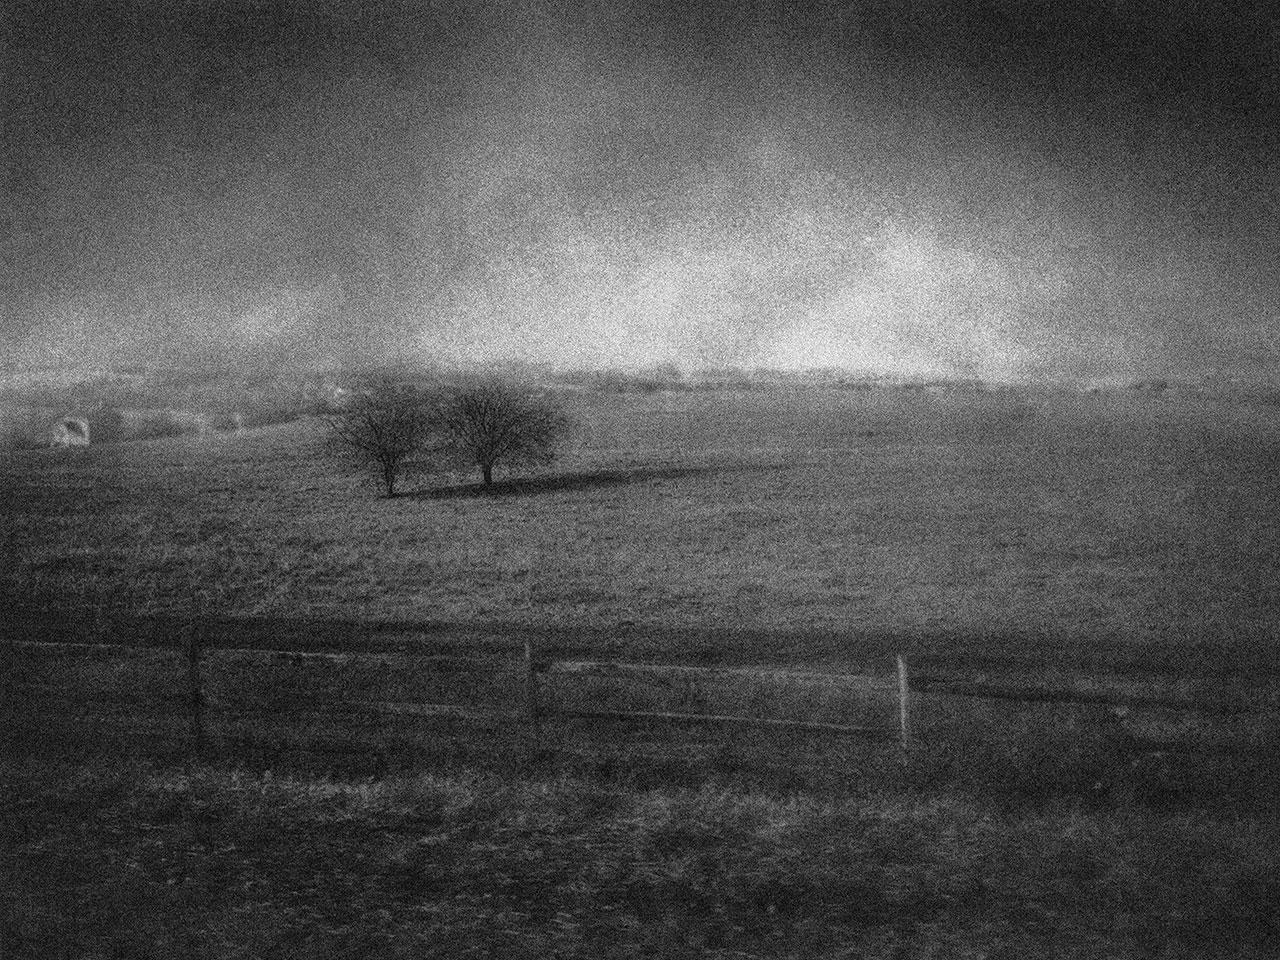 L.S. King - Road Diaries - Felix Schoeller Photoaward